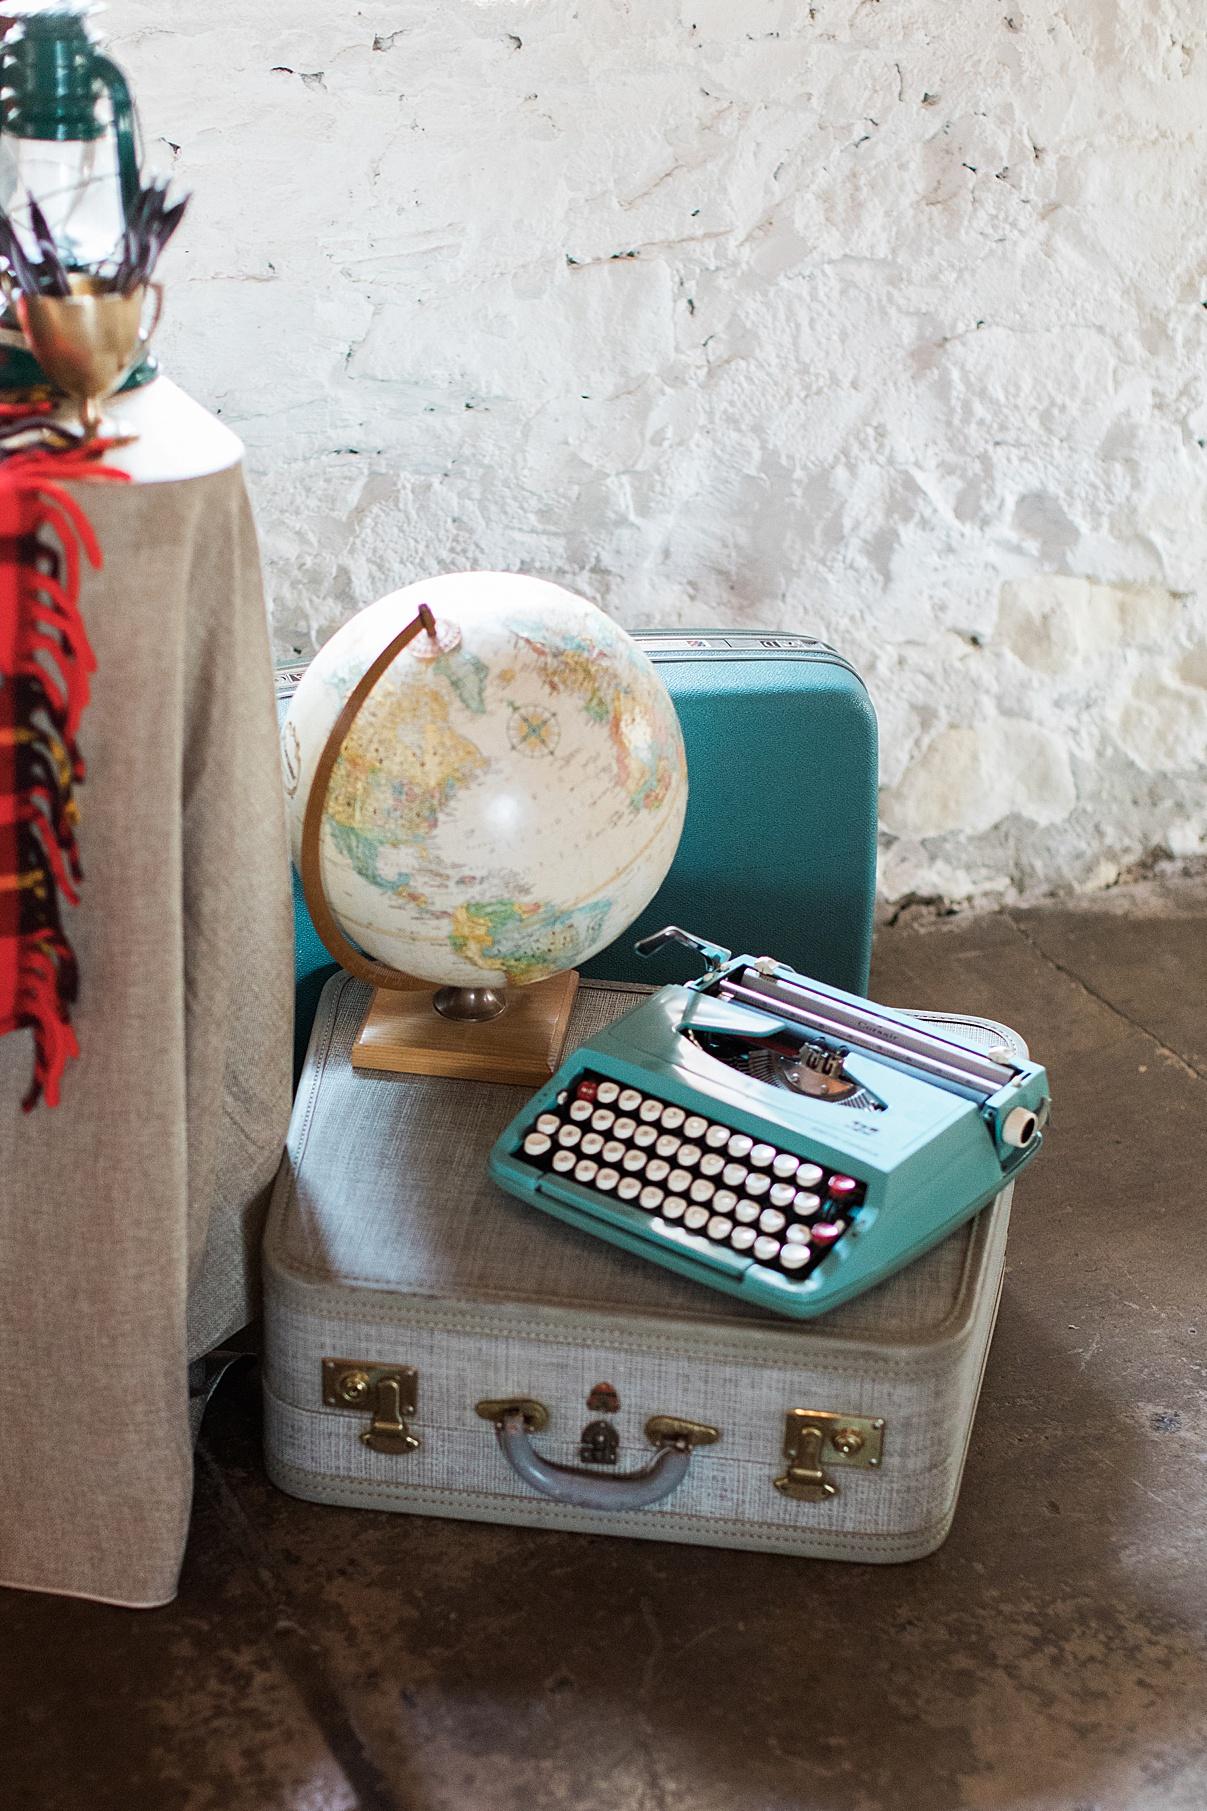 Globe and typewriter sitting on suitcase at wedding reception in Balls Falls, Ontario Wedding| Ontario Wedding Photographer| Toronto Wedding Photographer| 3Photography| 3photography.ca